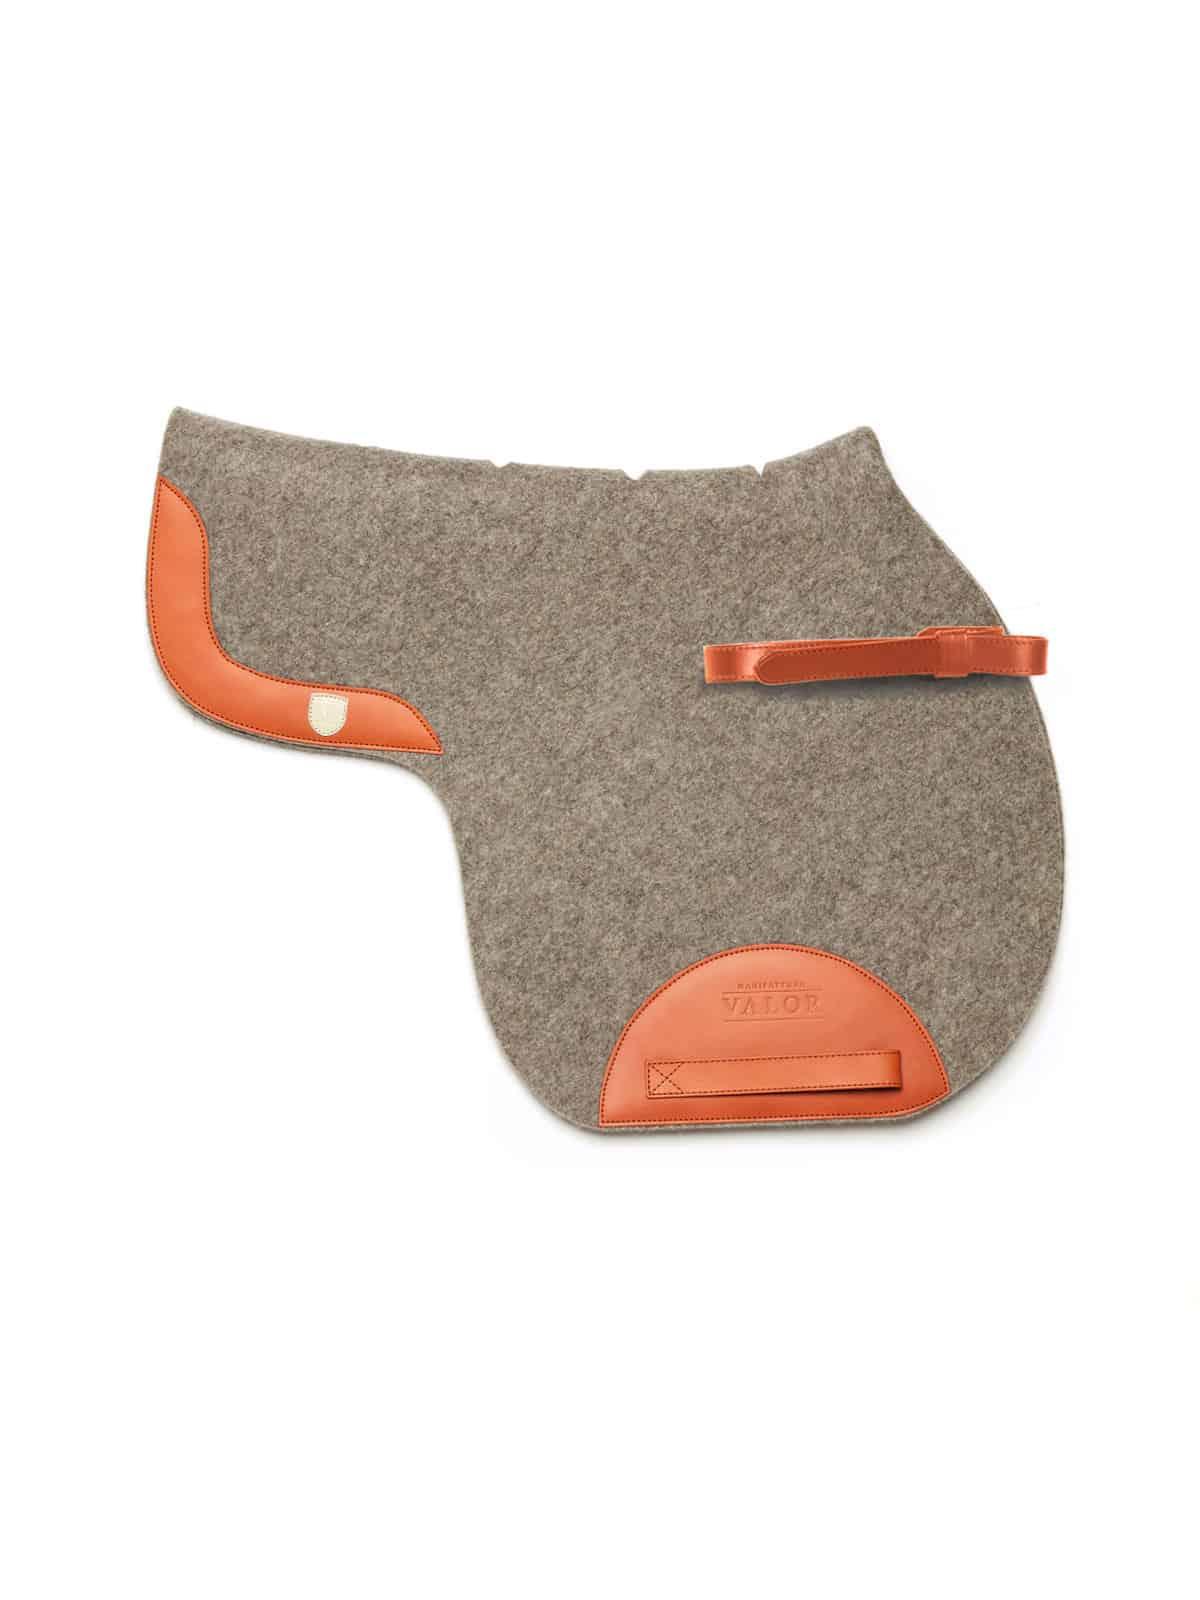 best saddle pad